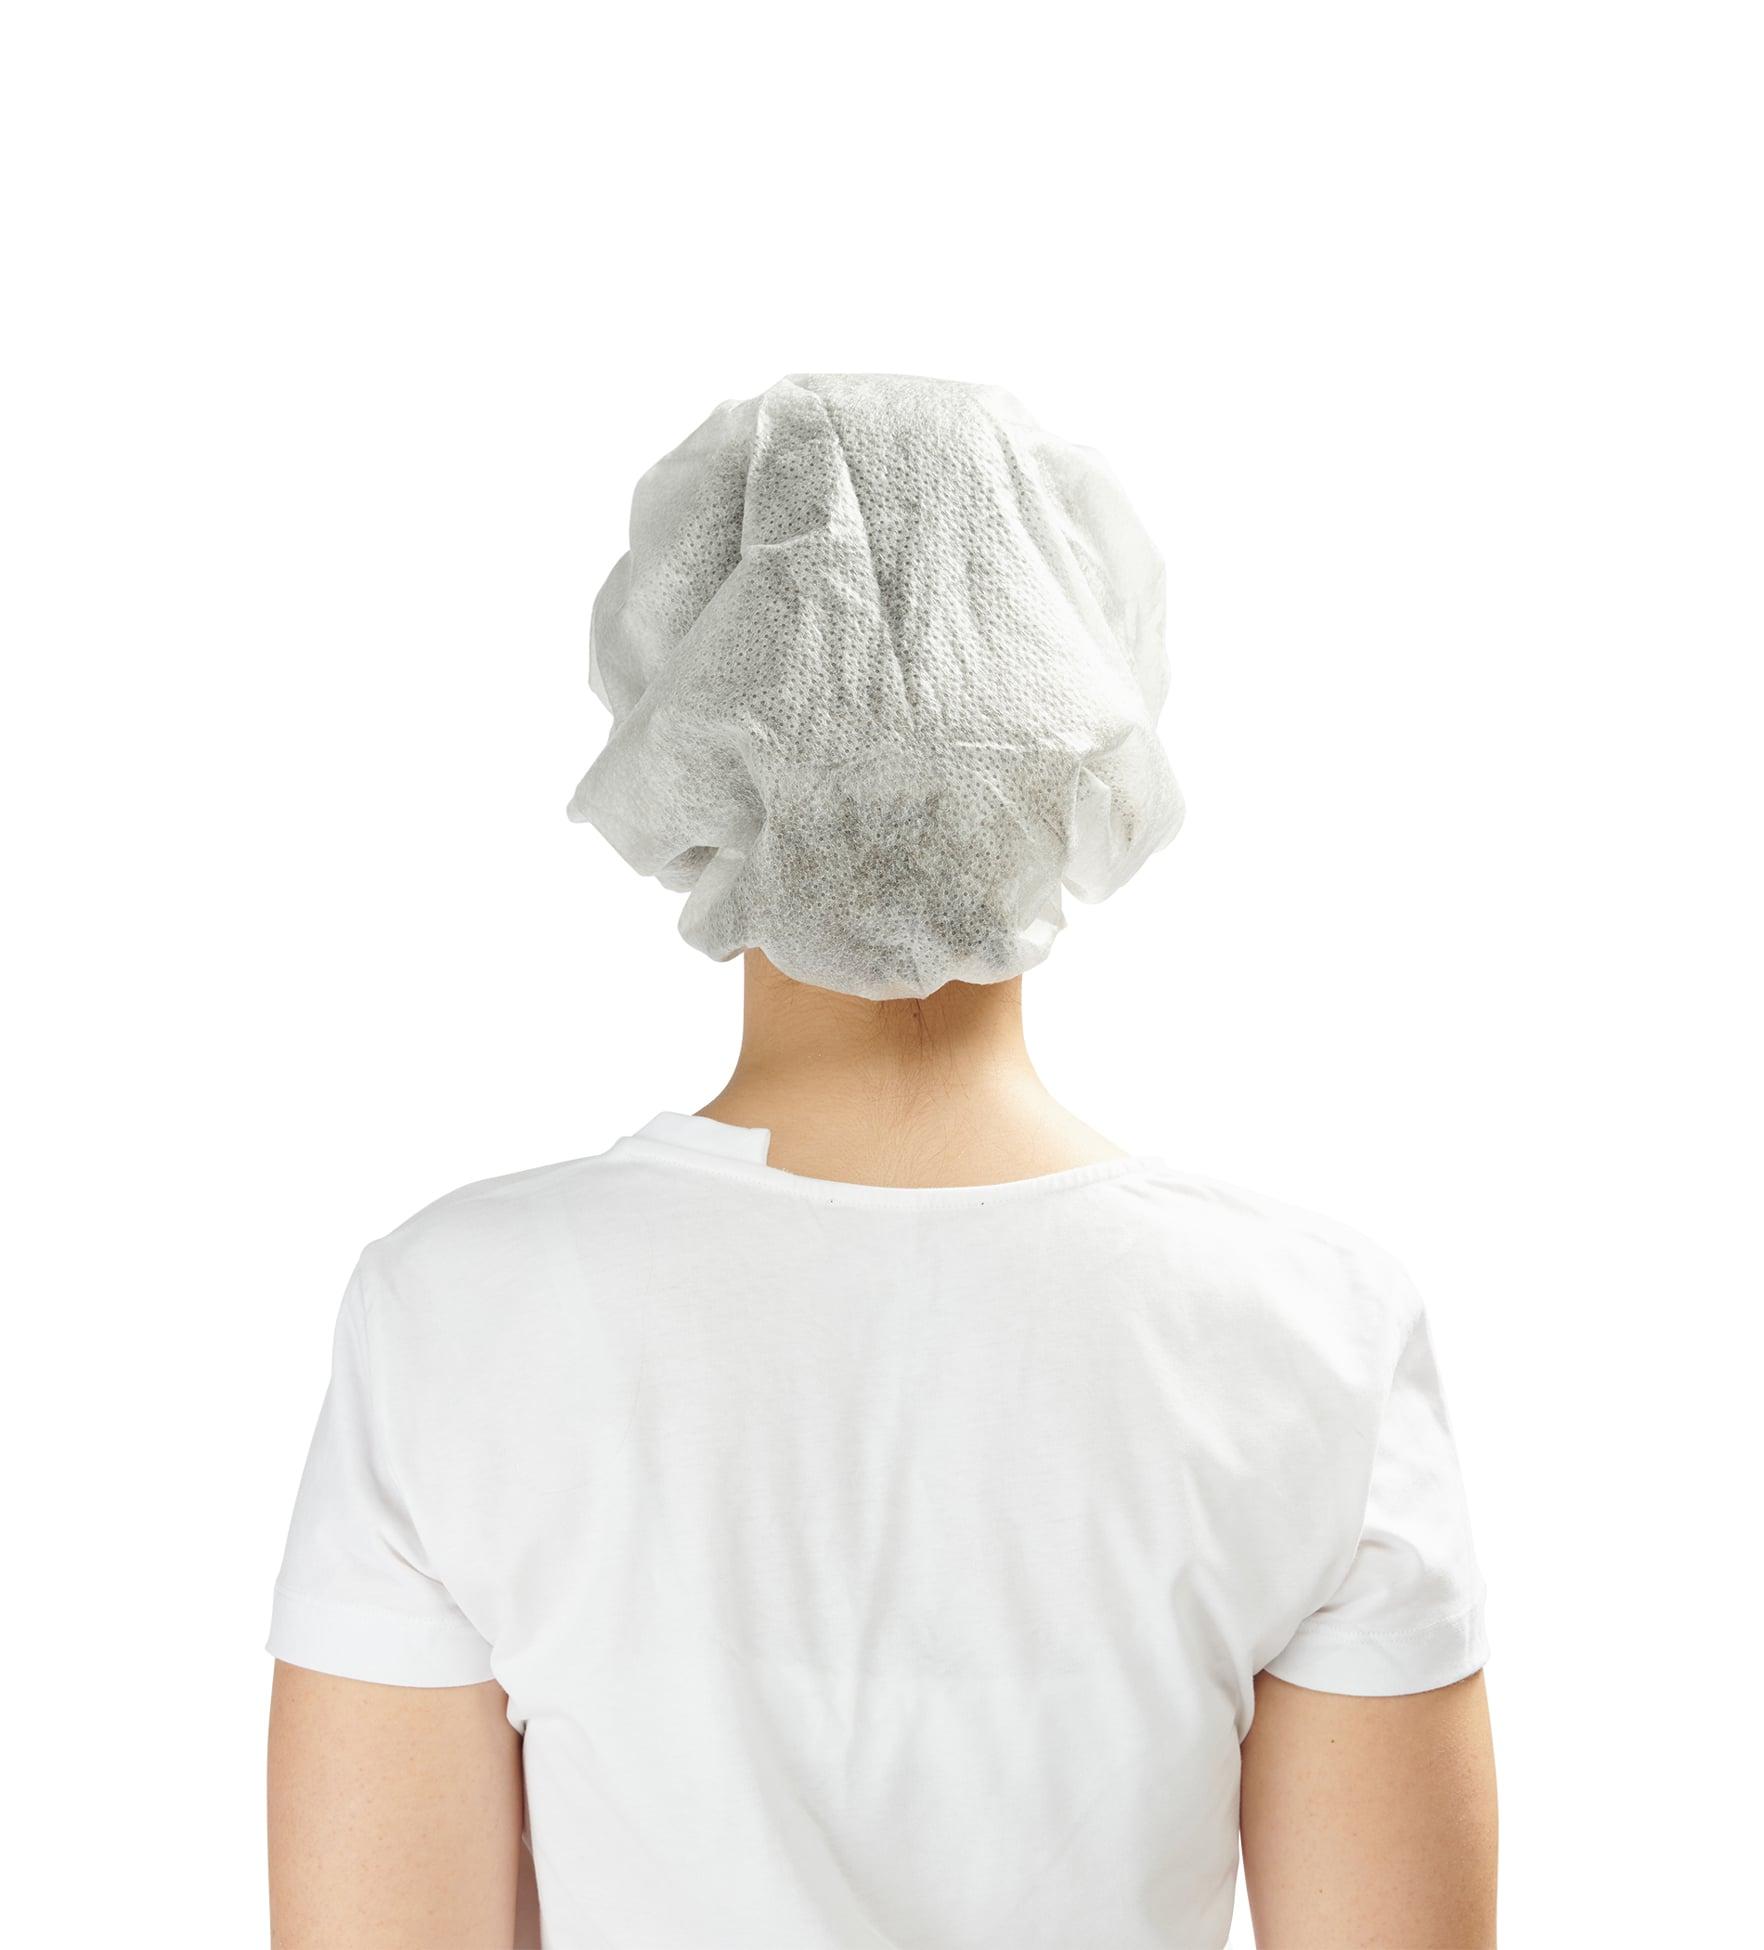 toucas hidrófugas 3 - water repellent caps - clothe protect